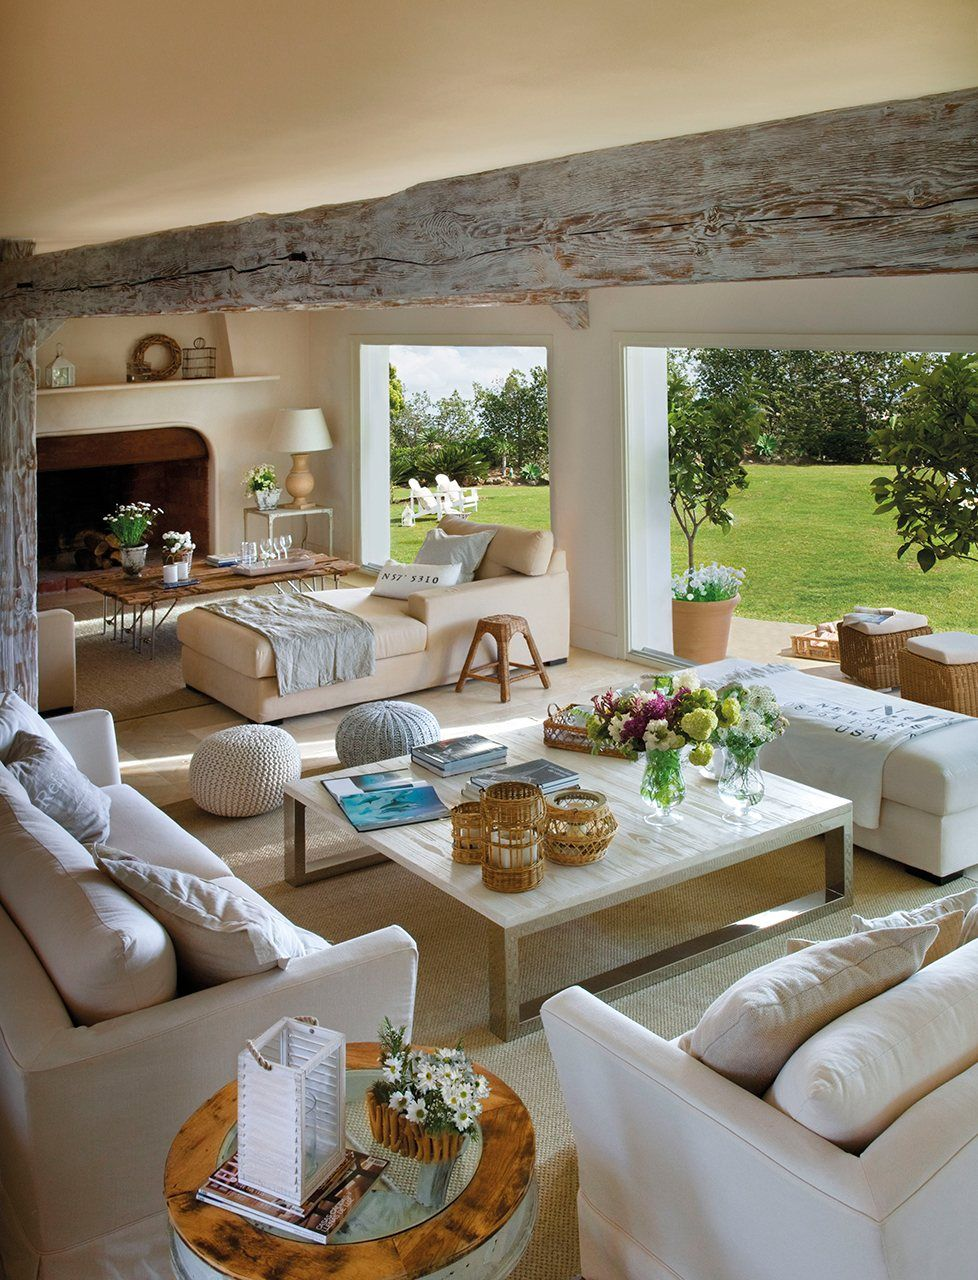 Una casa renovada para una gran familia | Pinterest | Chaise longue ...